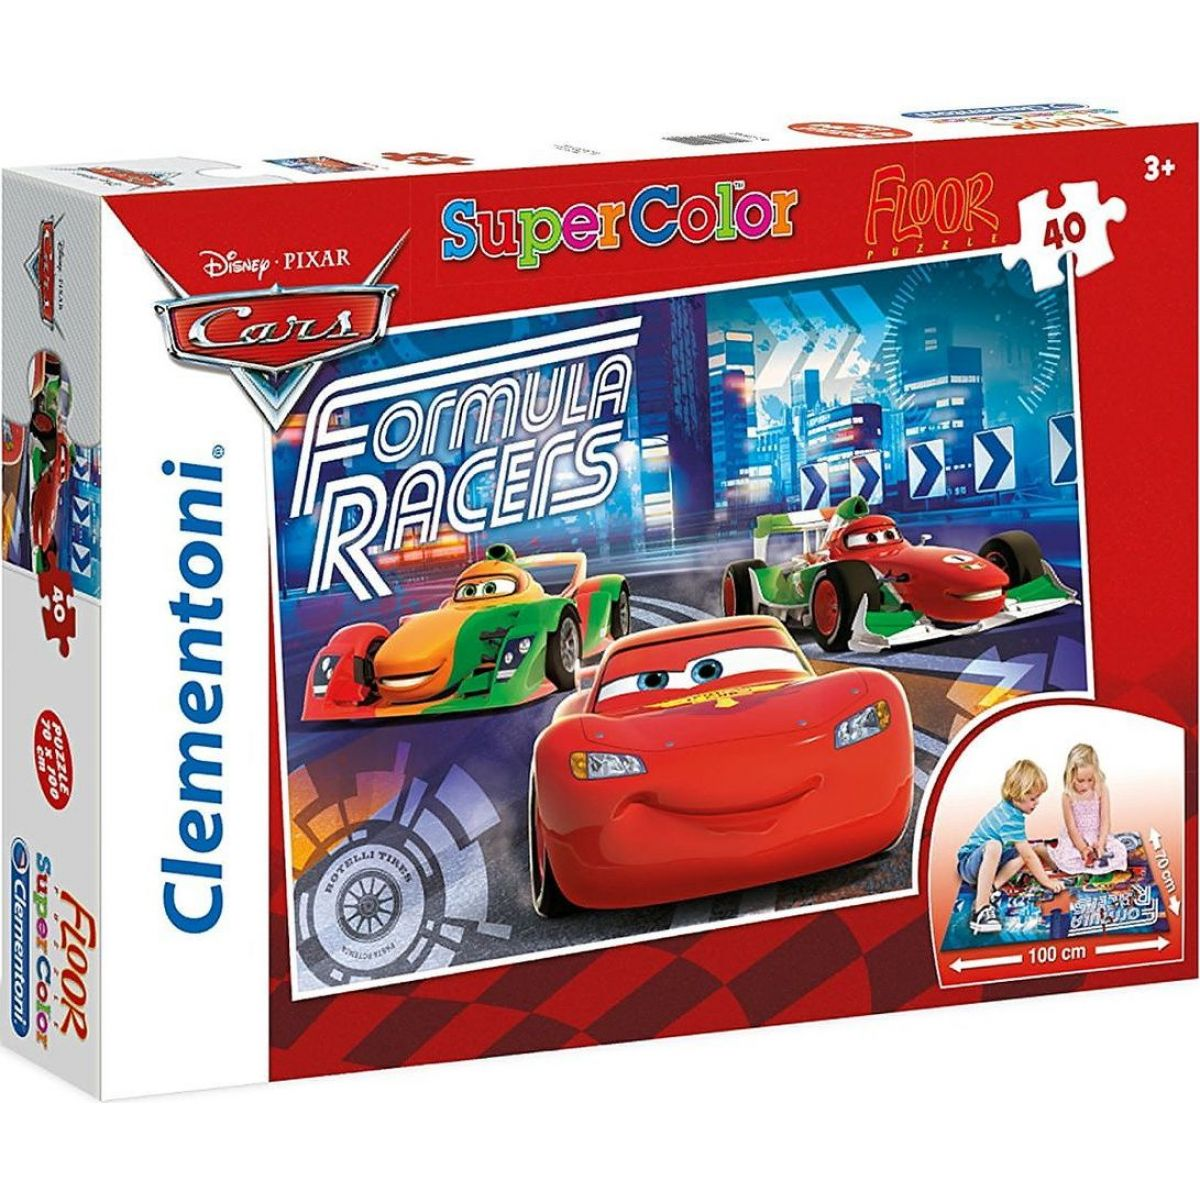 Clementoni 40 dílků SUPER KOLOR Cars 25442